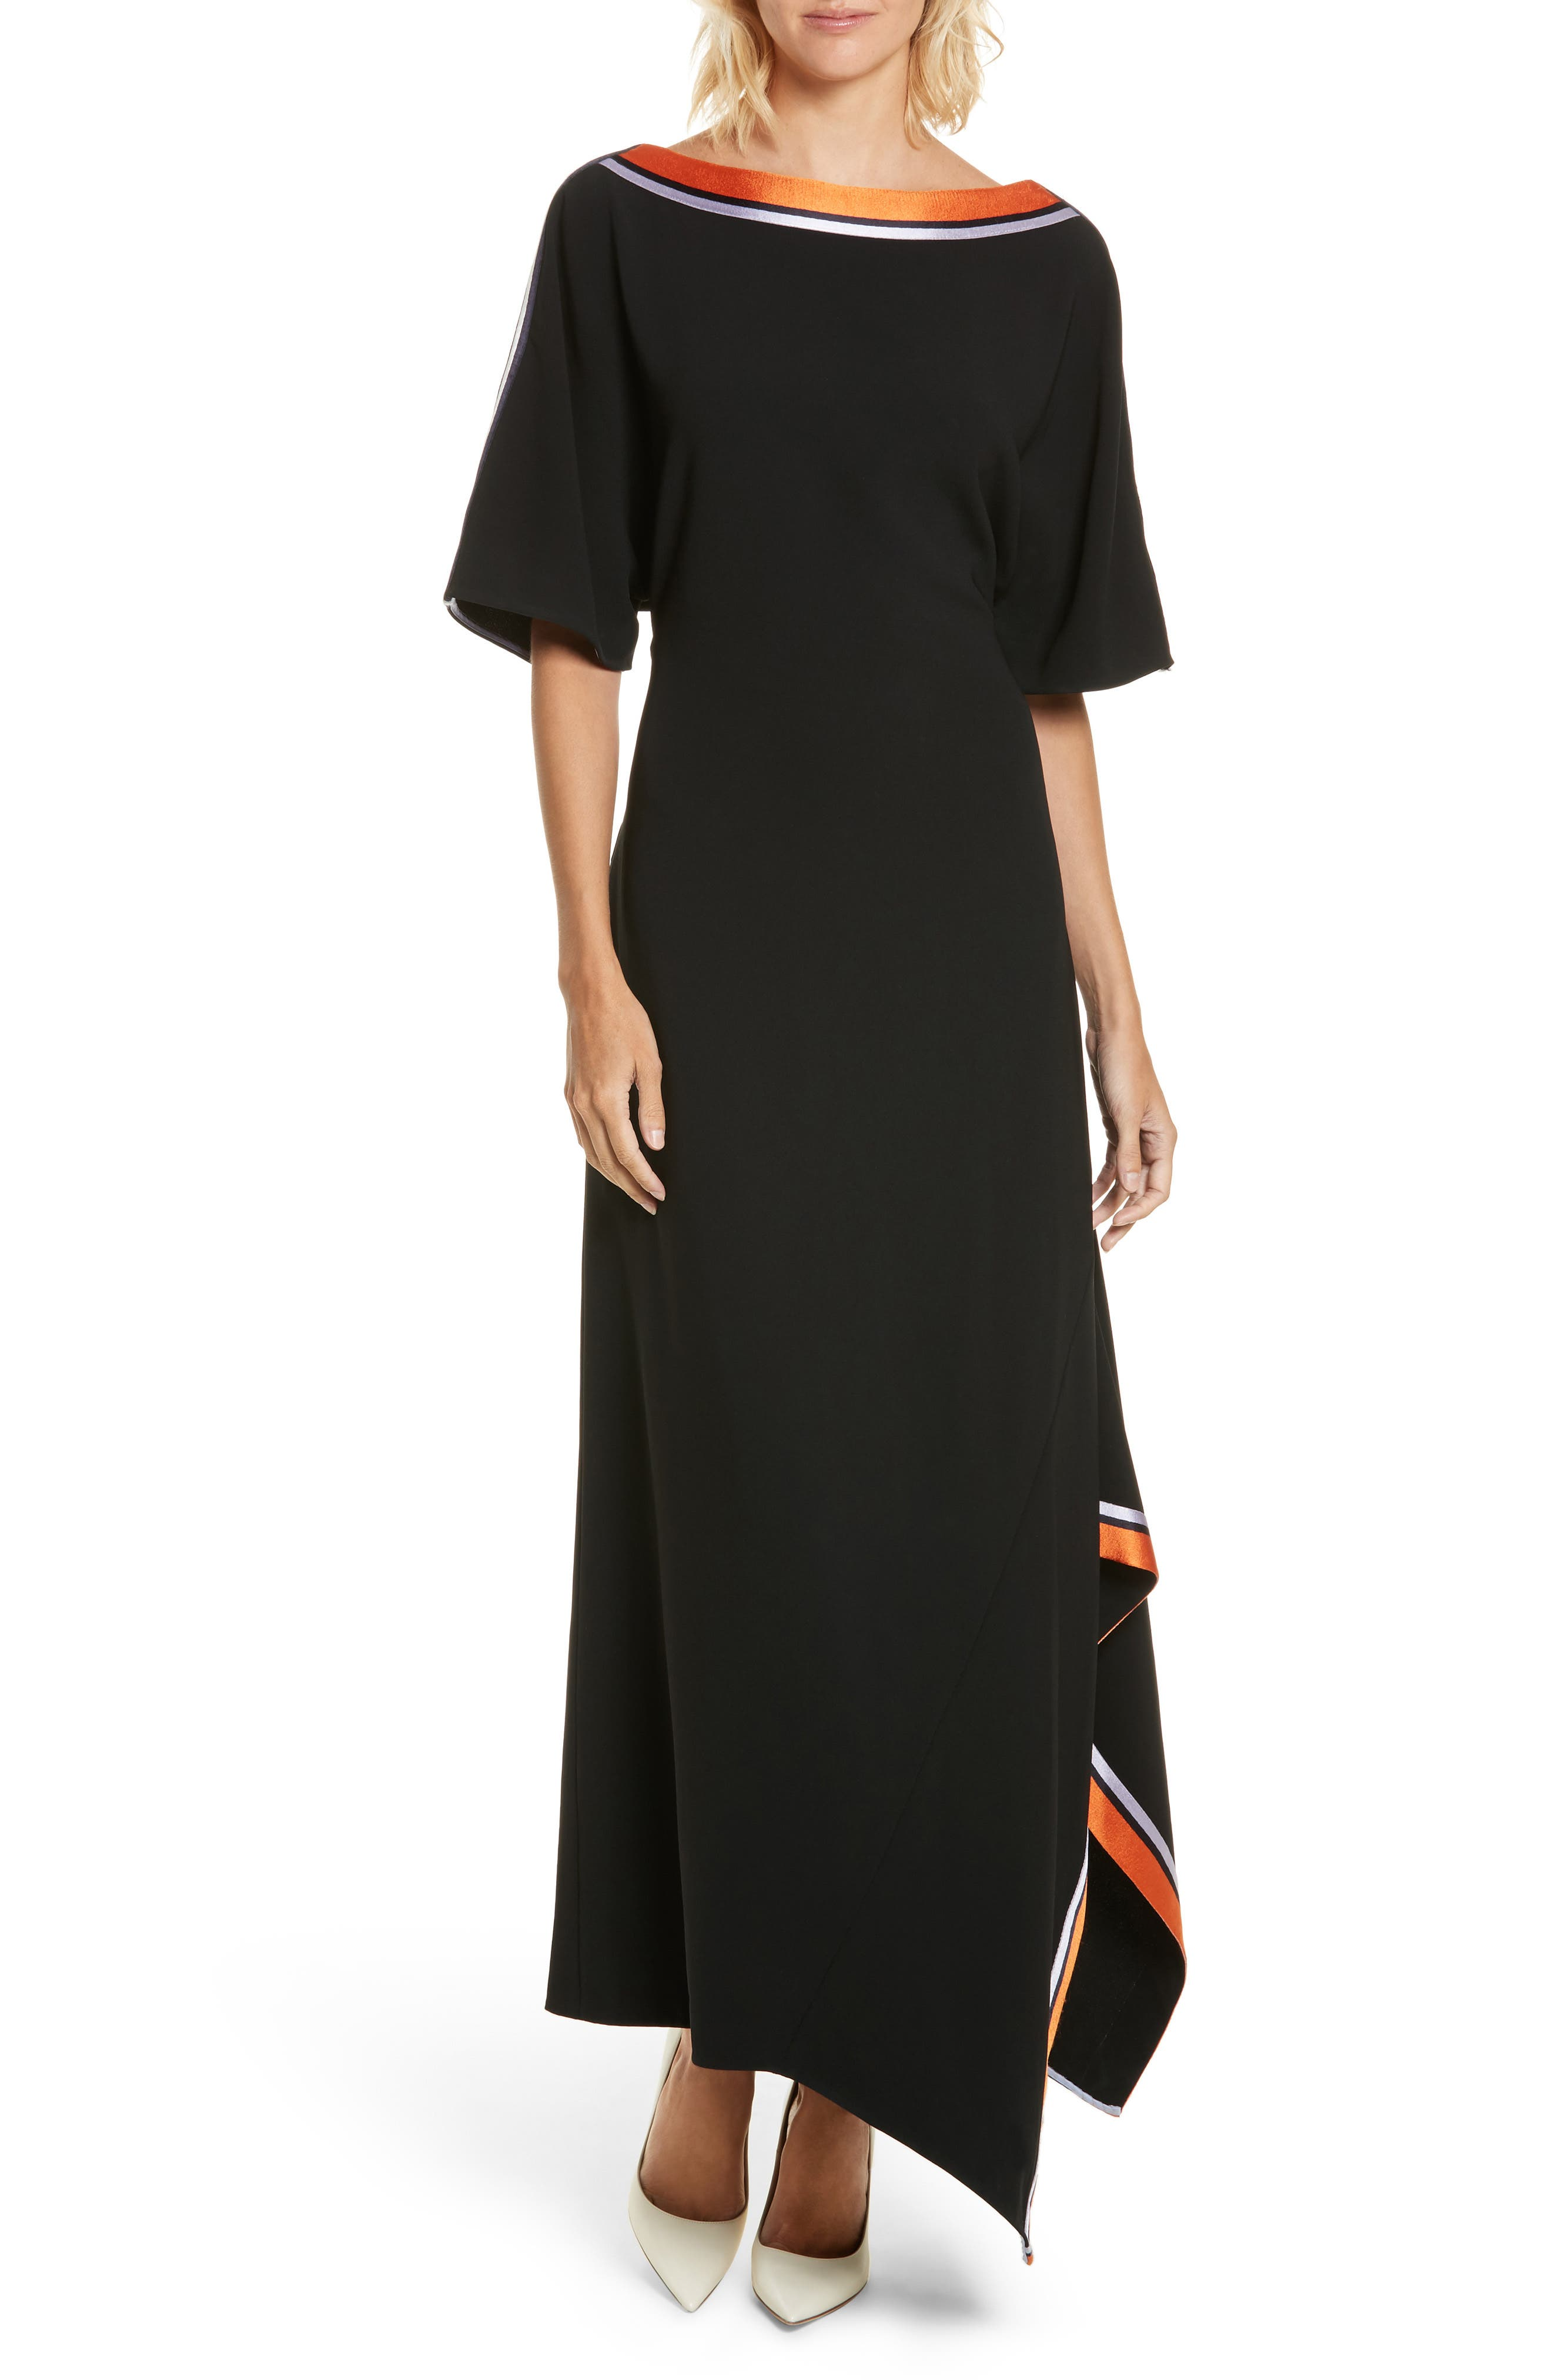 Main Image - Diane von Furstenberg Open Back Ribbon Trim Dress